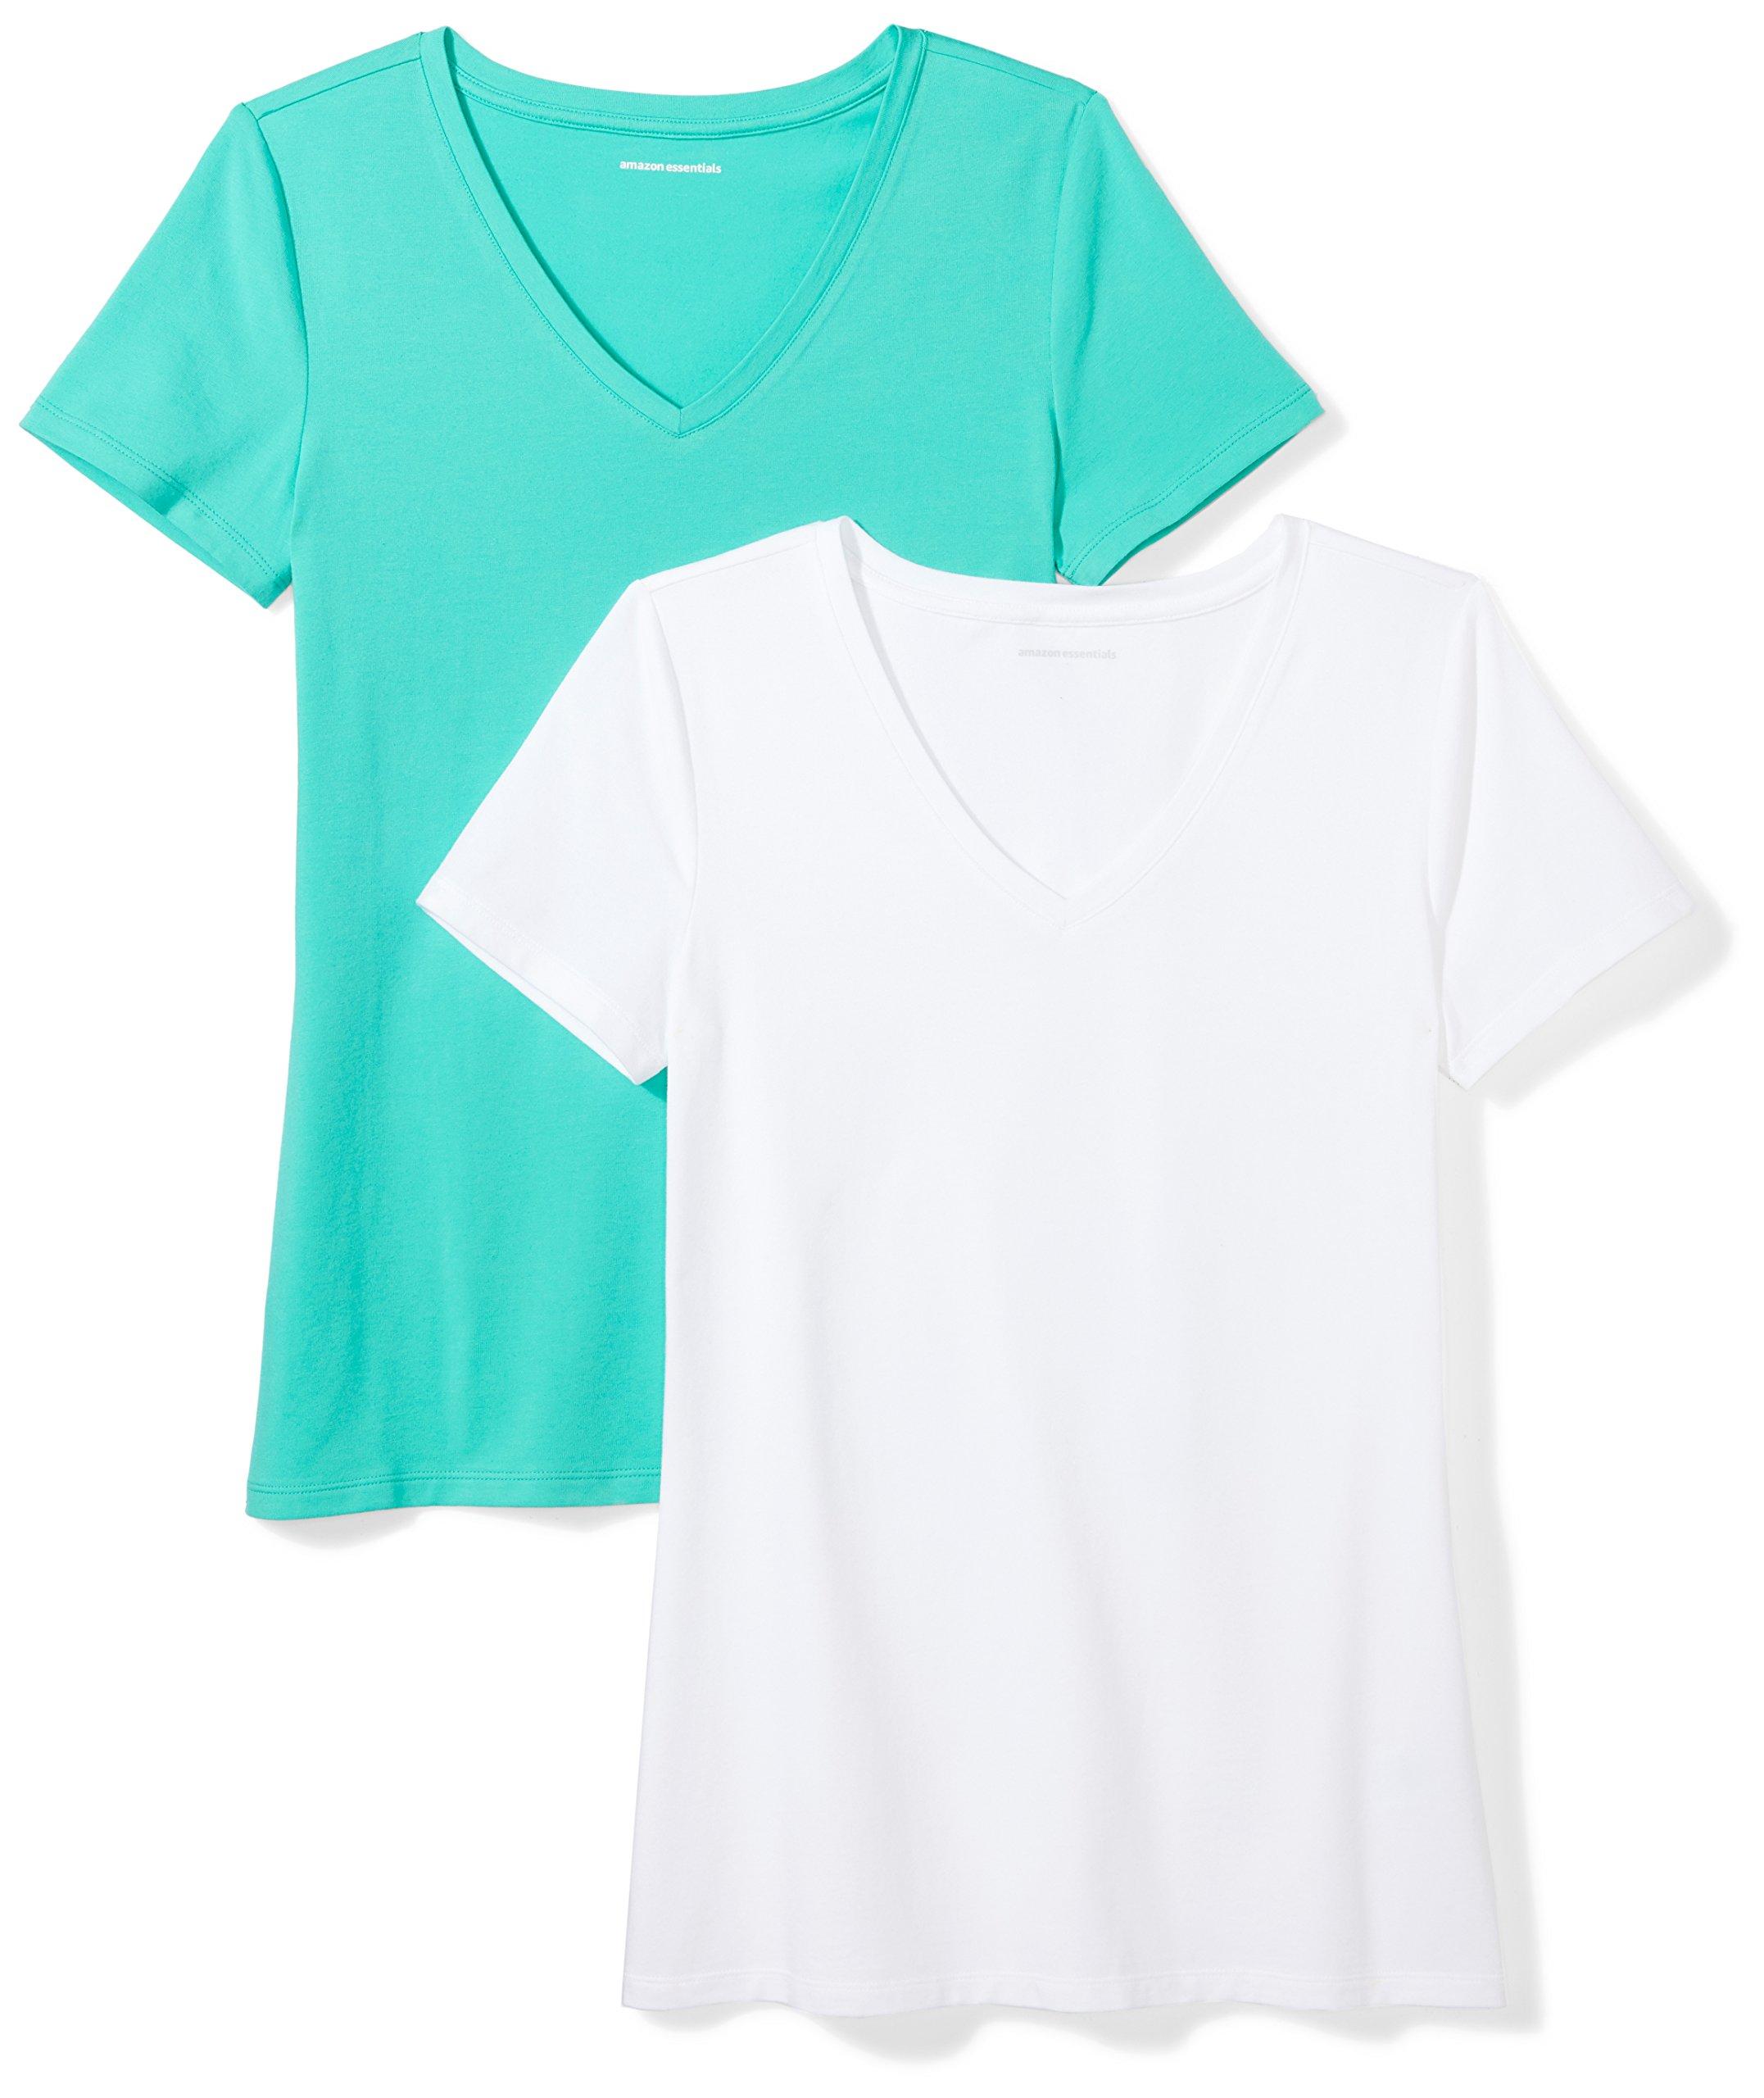 becf59d9799f Amazon Essentials Women's 2-Pack Short-Sleeve V-Neck Solid T-Shirt ...